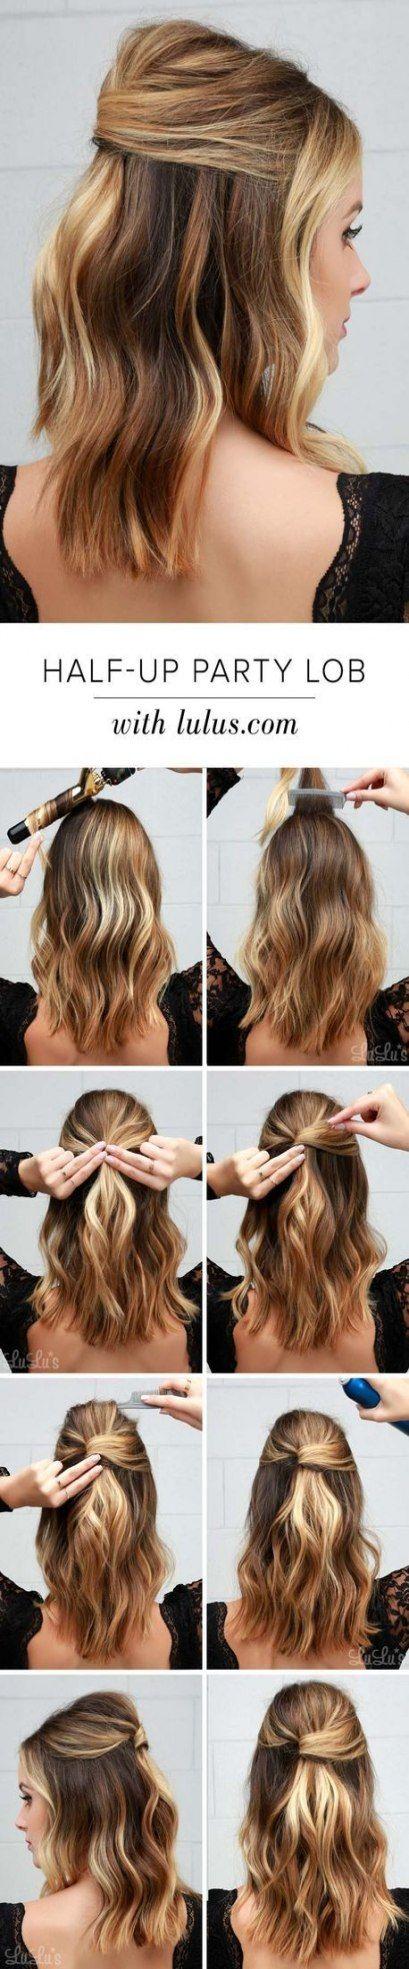 New wedding hairstyles messy boho up dos 31+ ideas